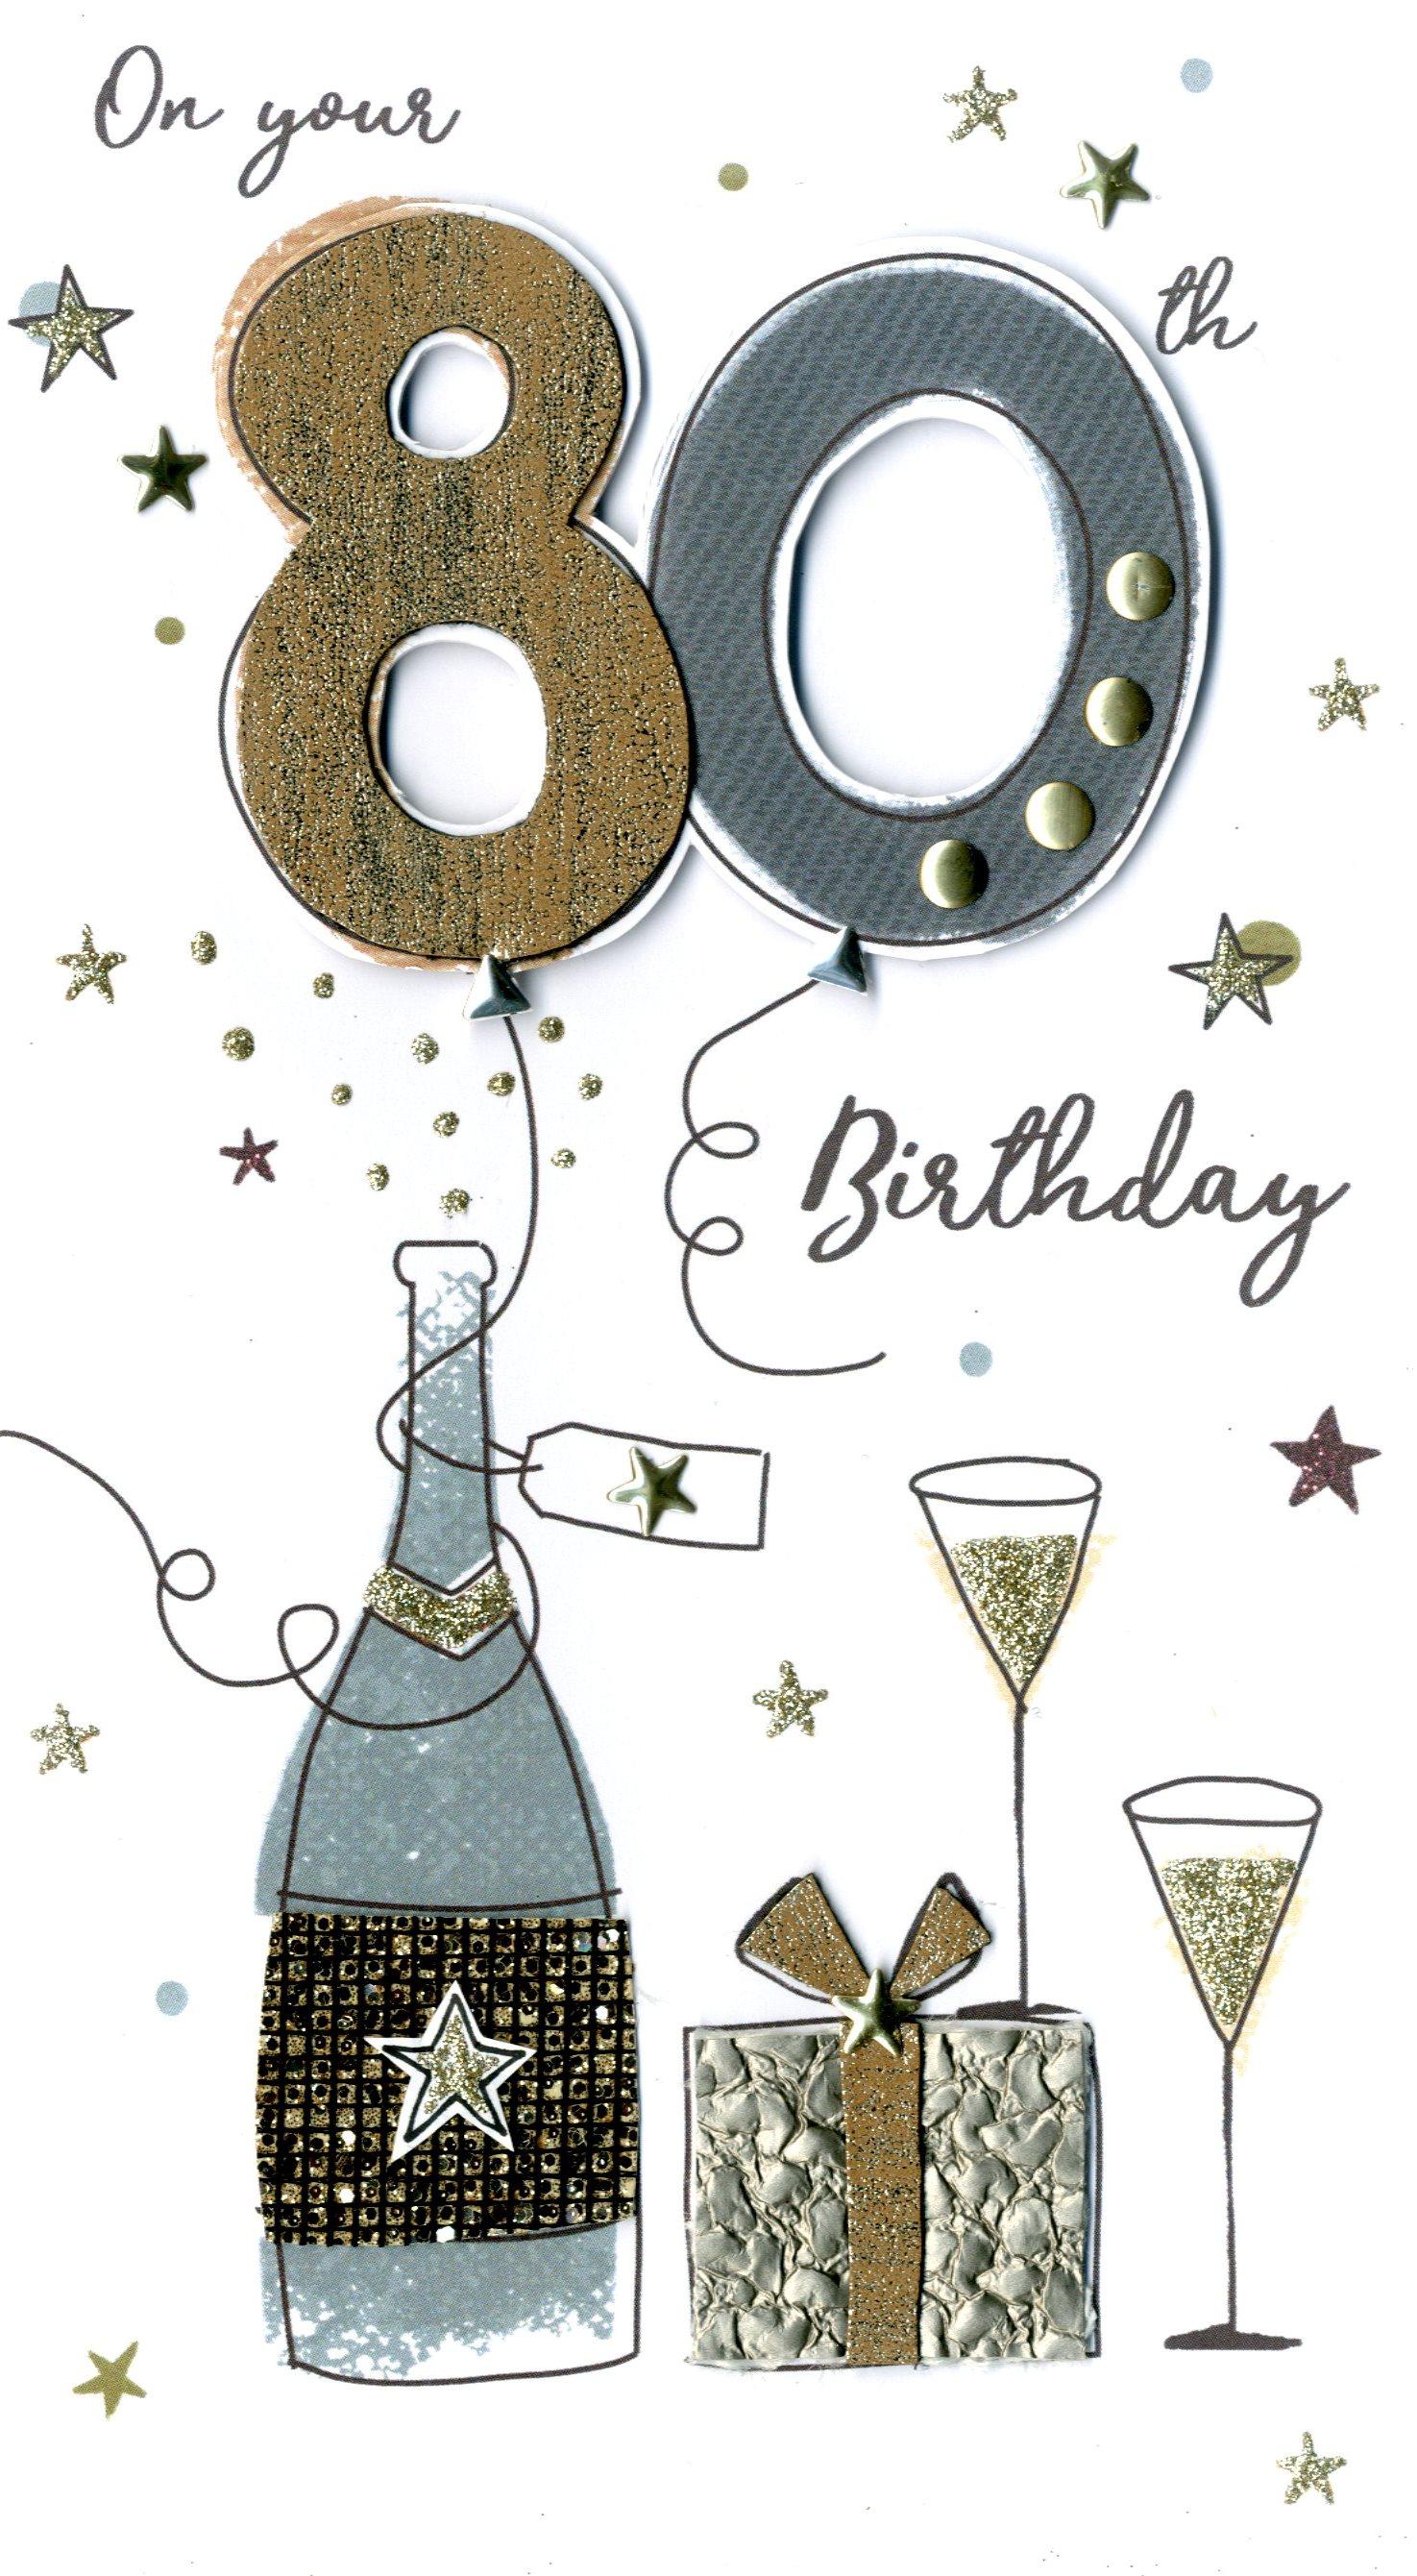 80th Birthday Greetings Images : birthday, greetings, images, Birthday, Greeting, Hand-Finished, Champagne, Range, Cards, 5034527291820